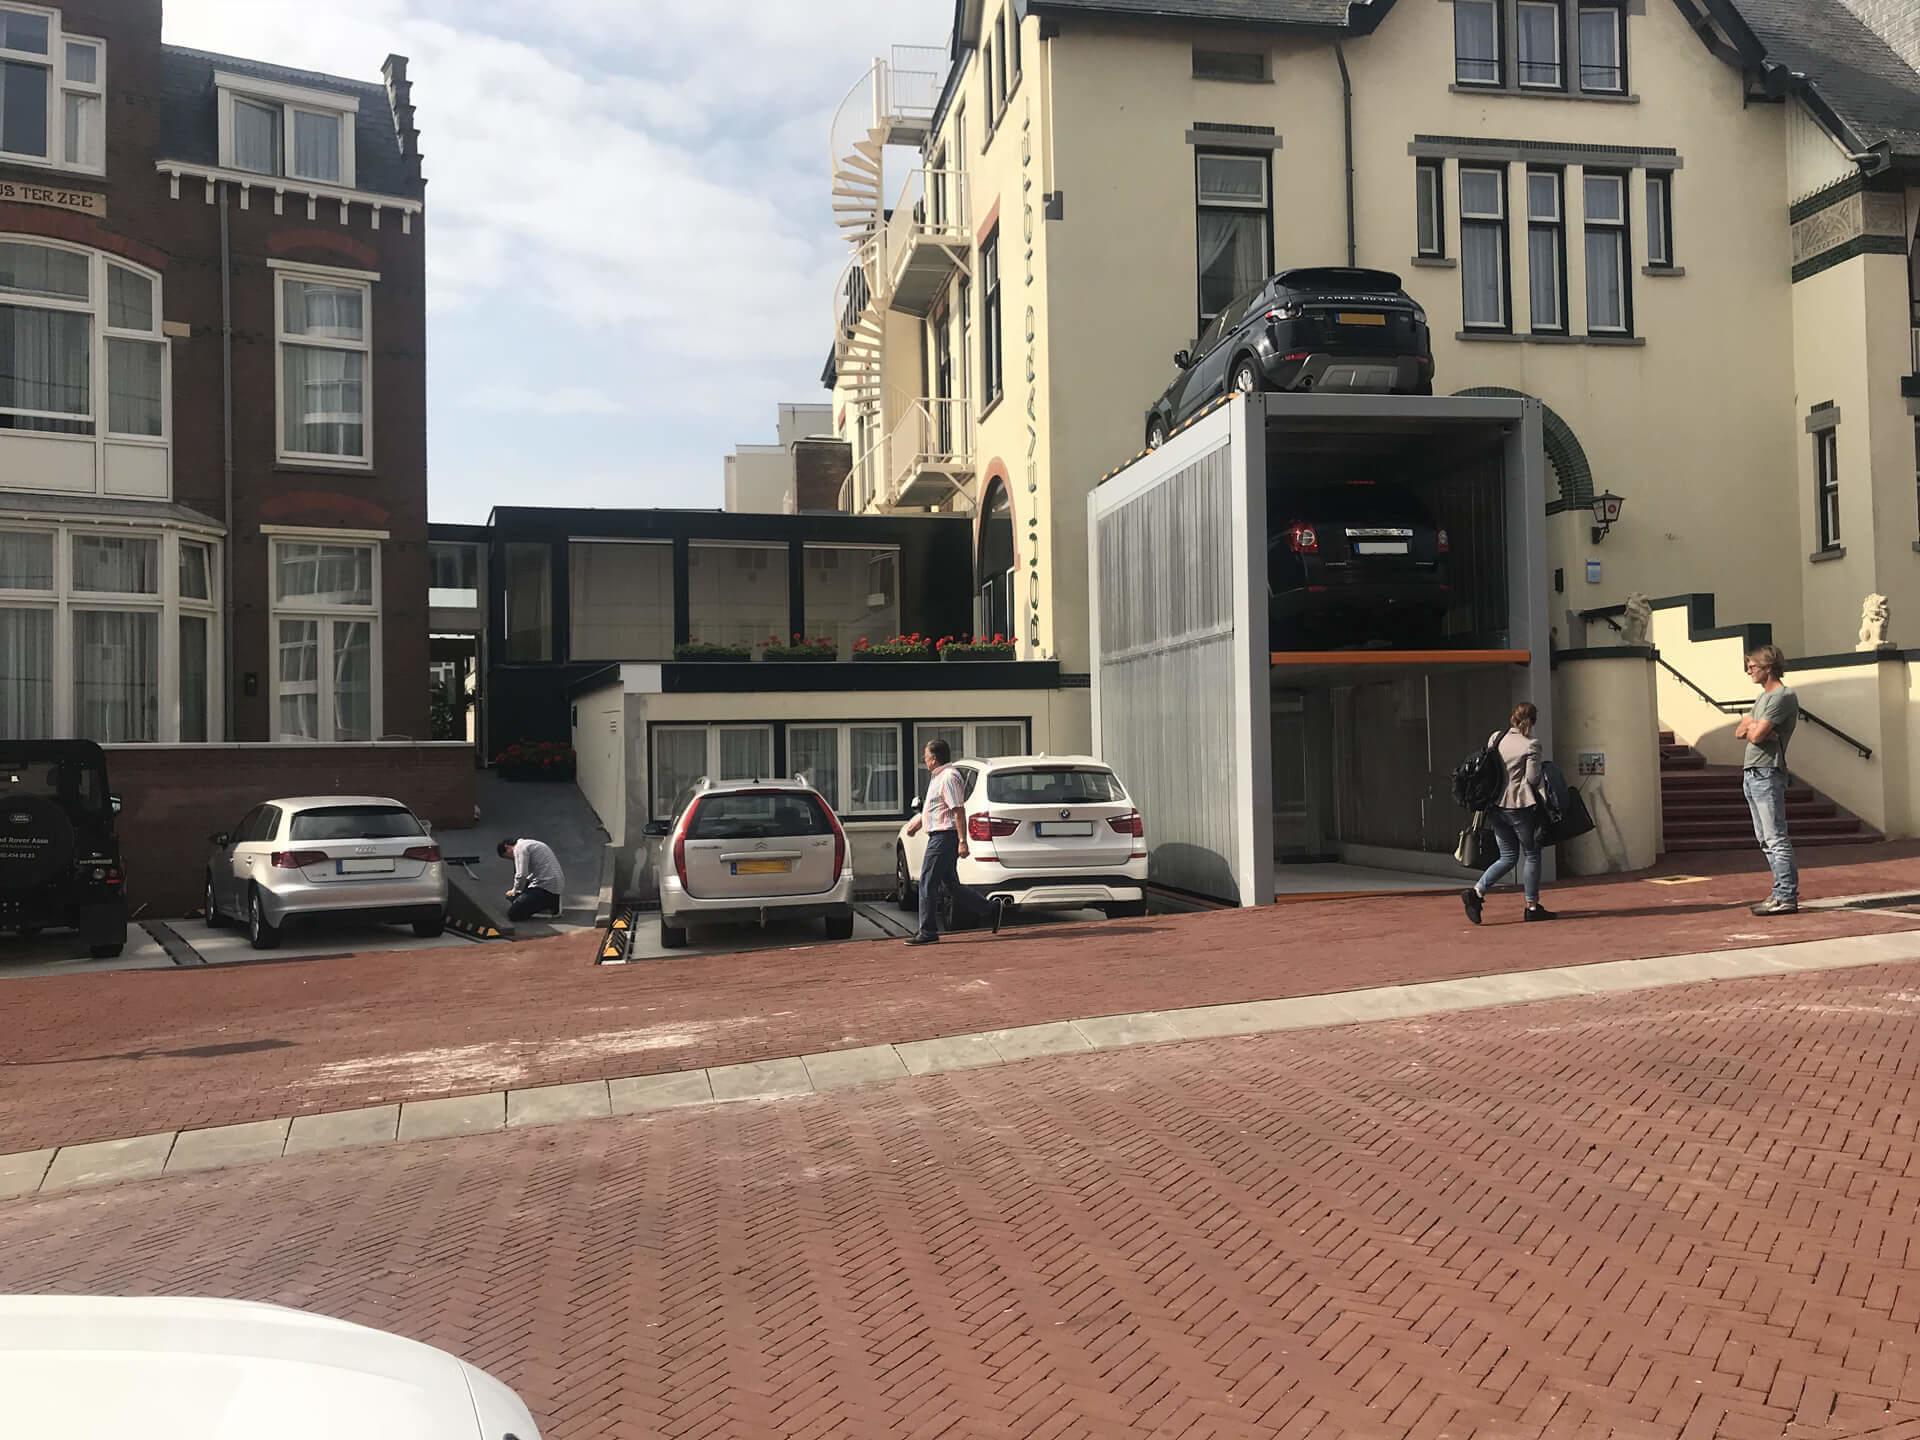 Project Parkeersysteem MultiBase U2 Scheveningen - Aarding Parking Systems 1